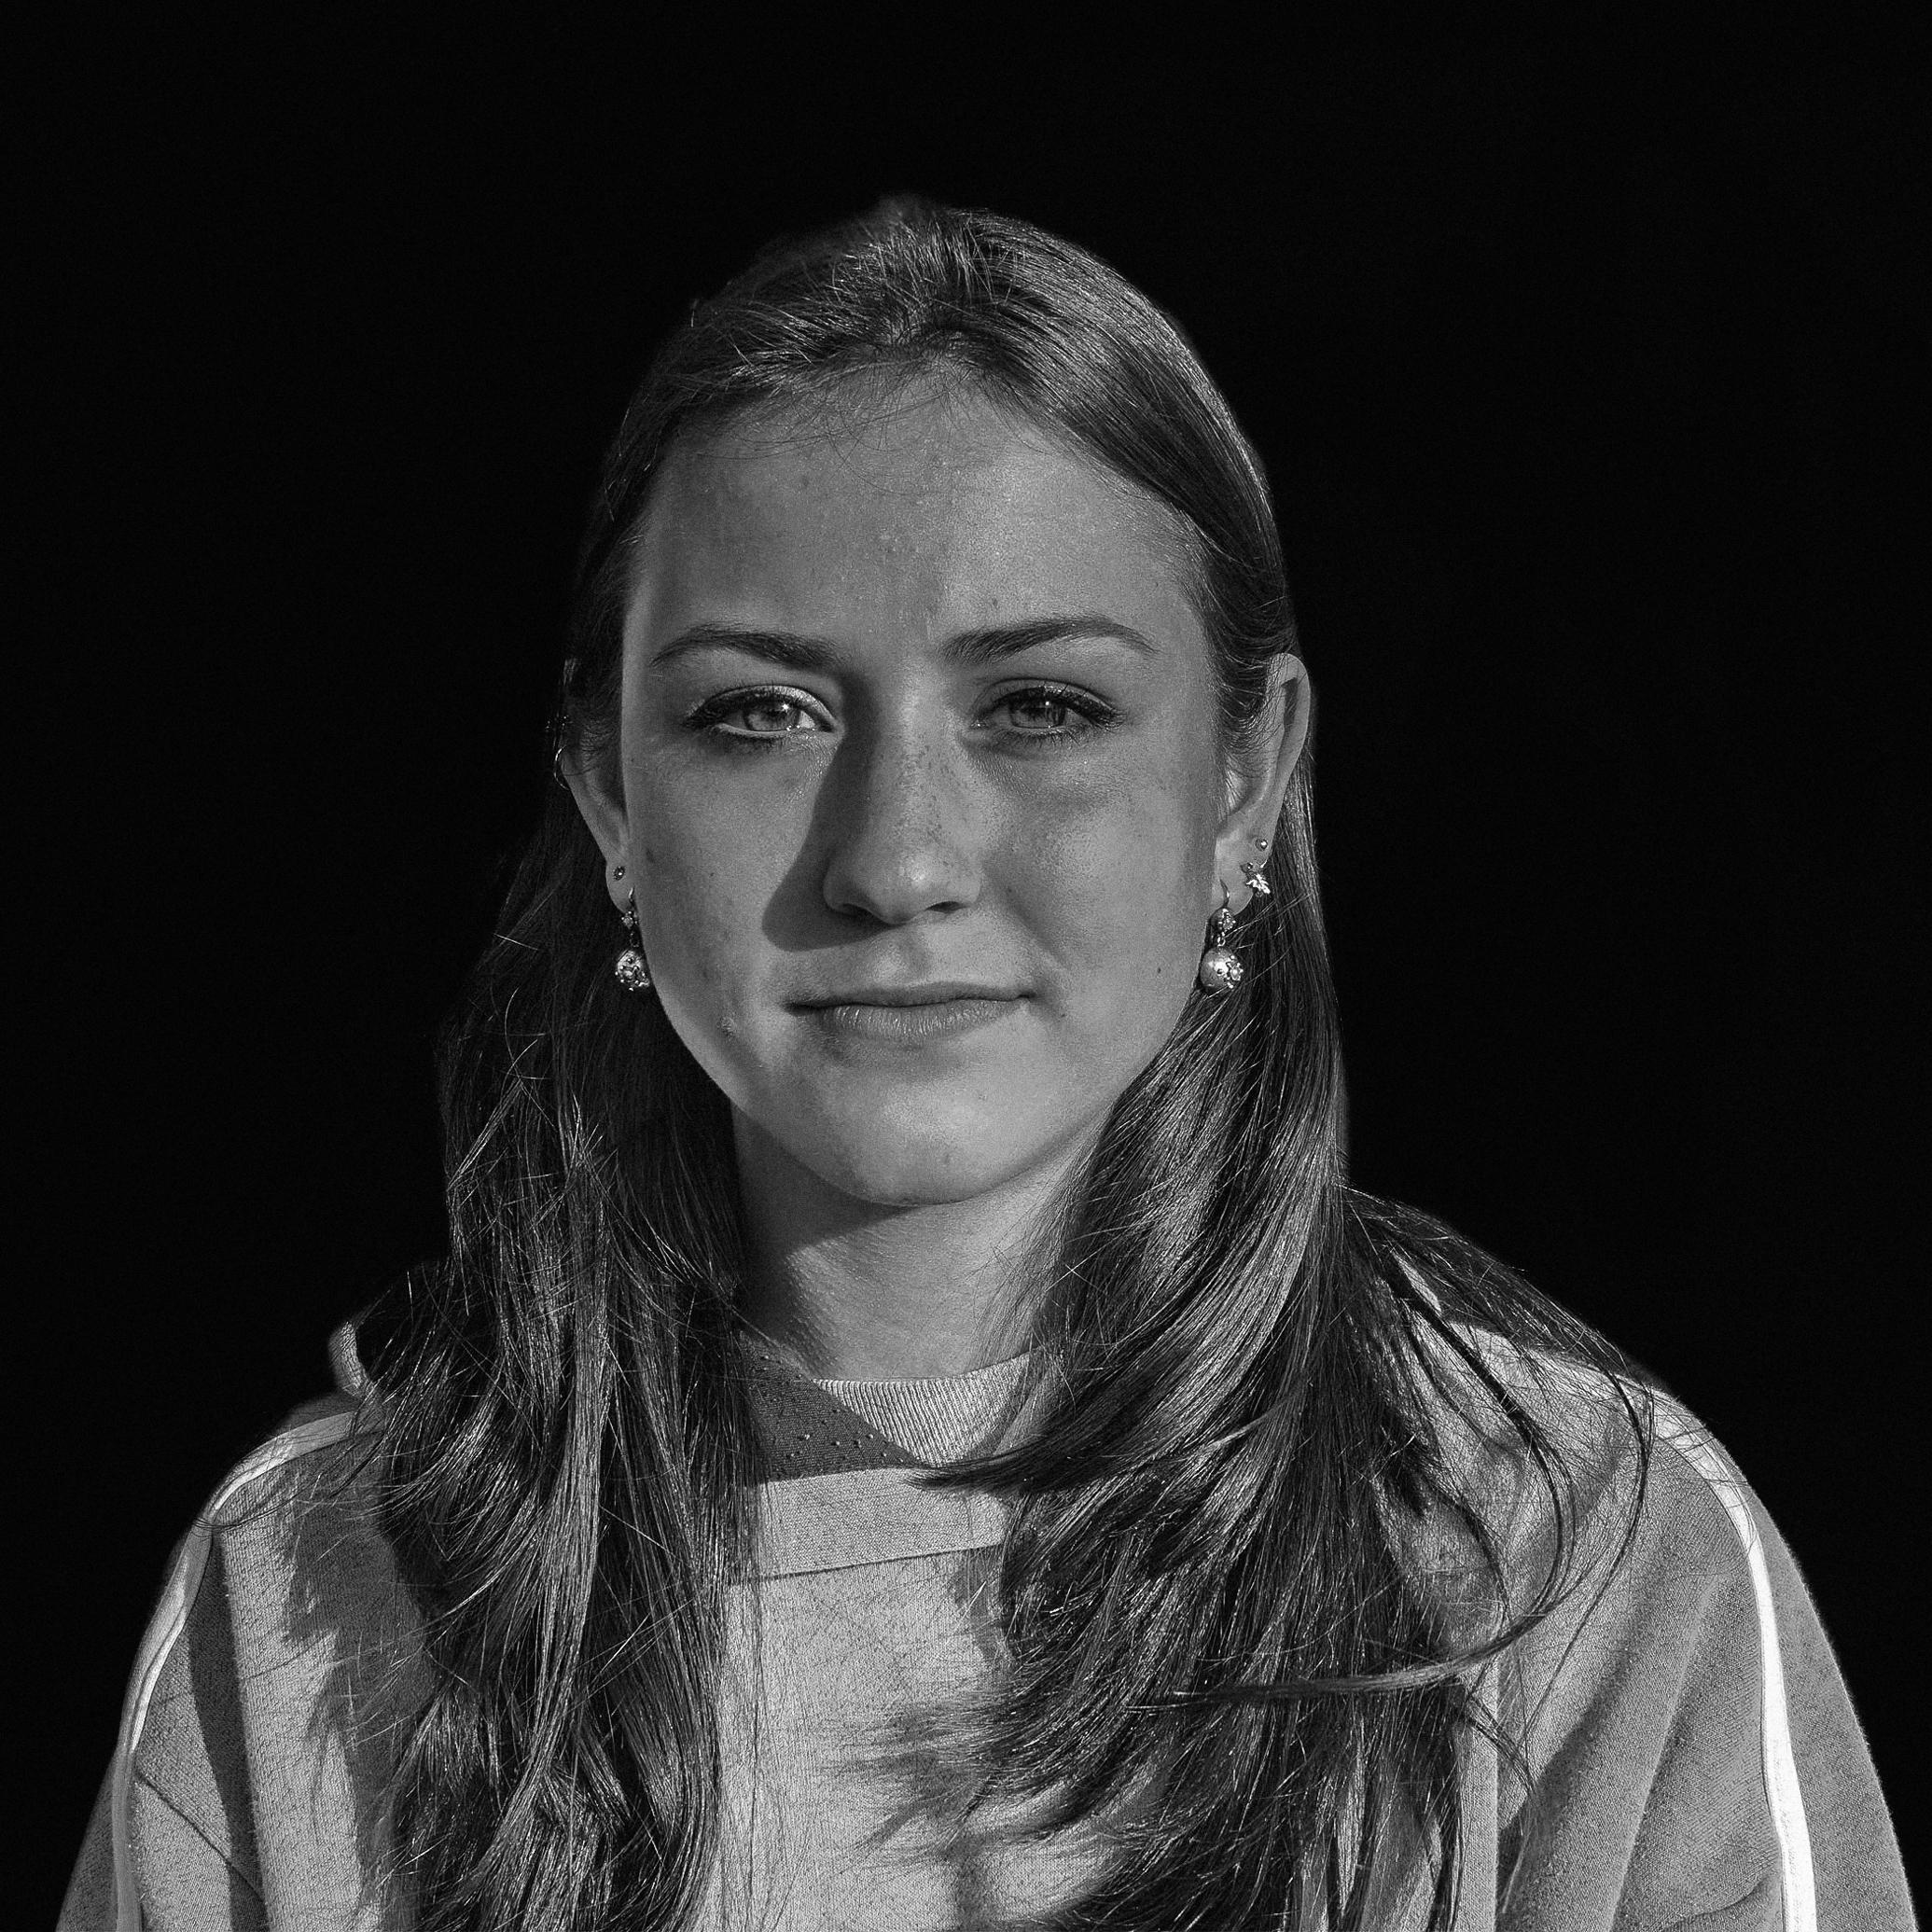 Mary Scoular - IZZY